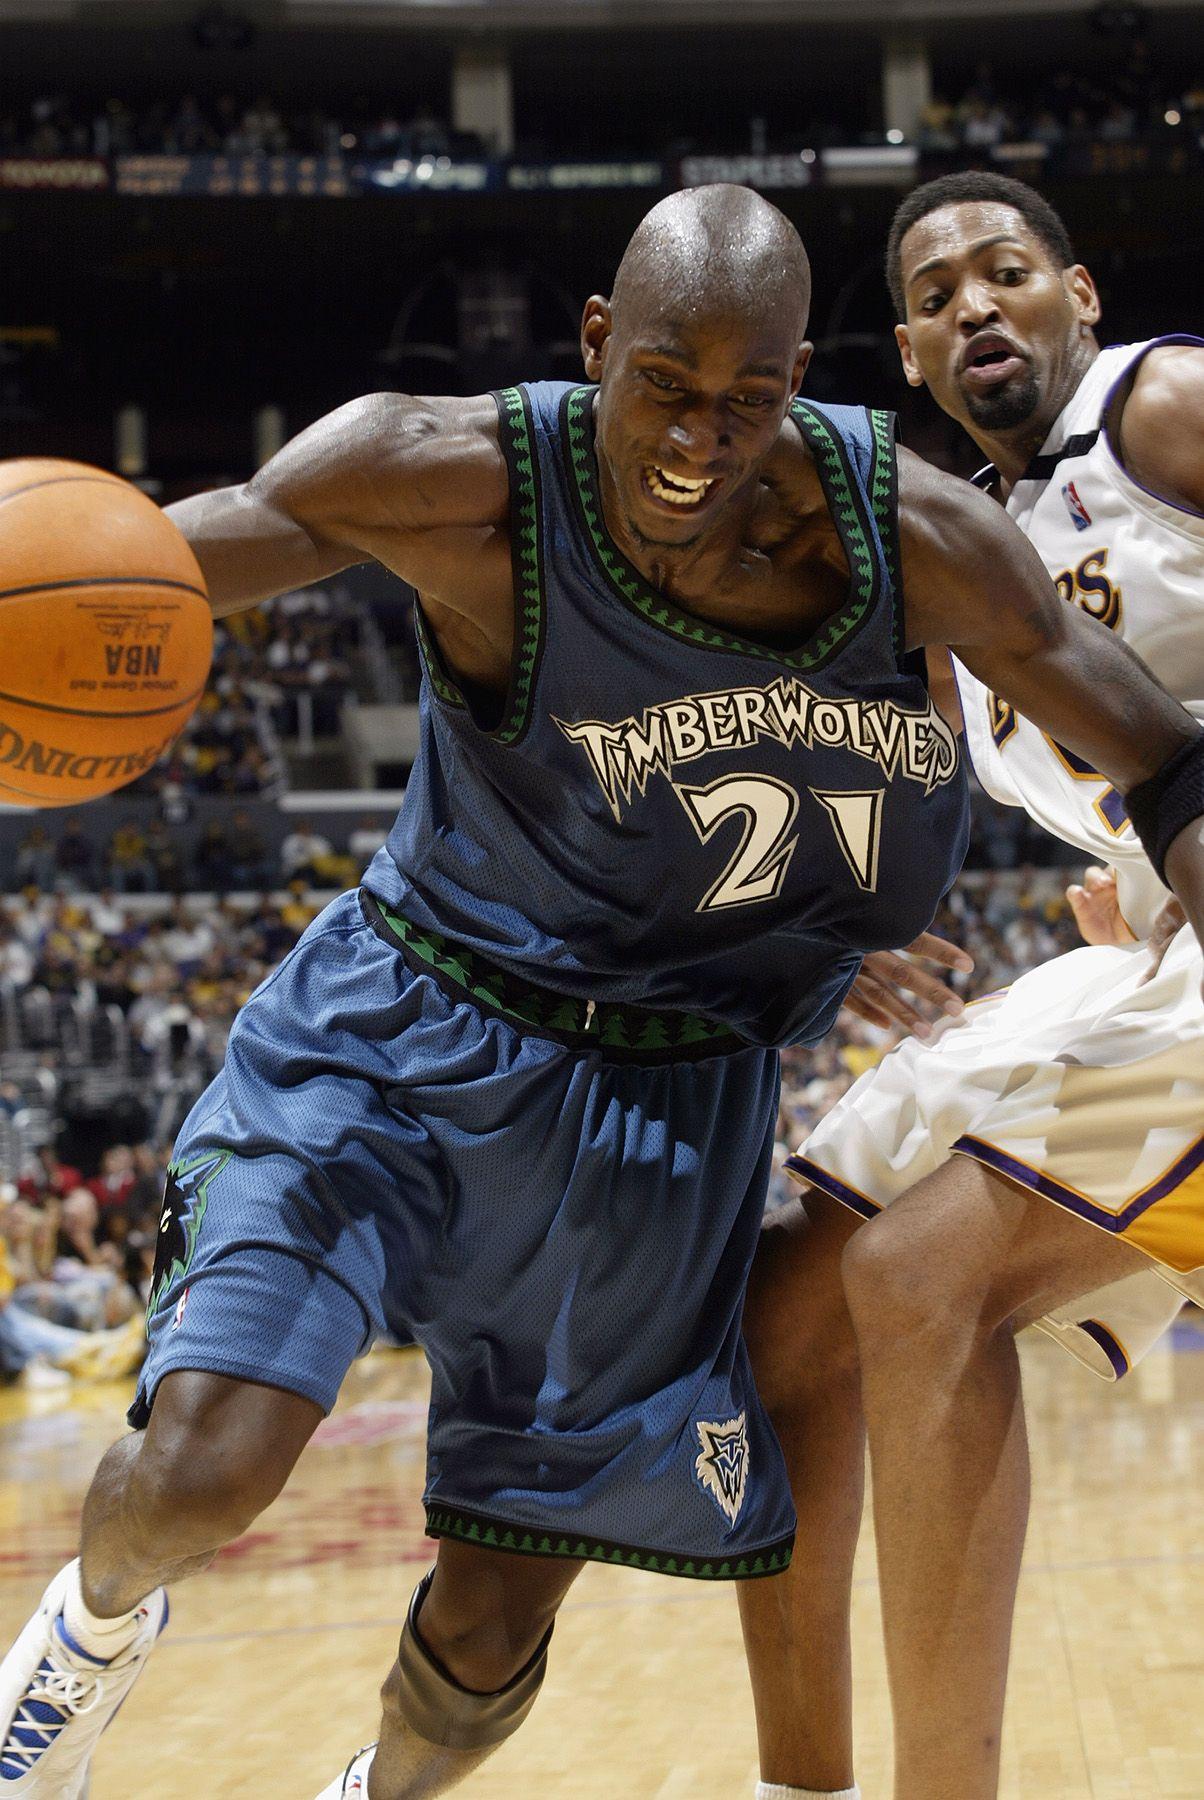 Kevin Garnett Minnesota Timberwolves Robert Horry Los Angeles